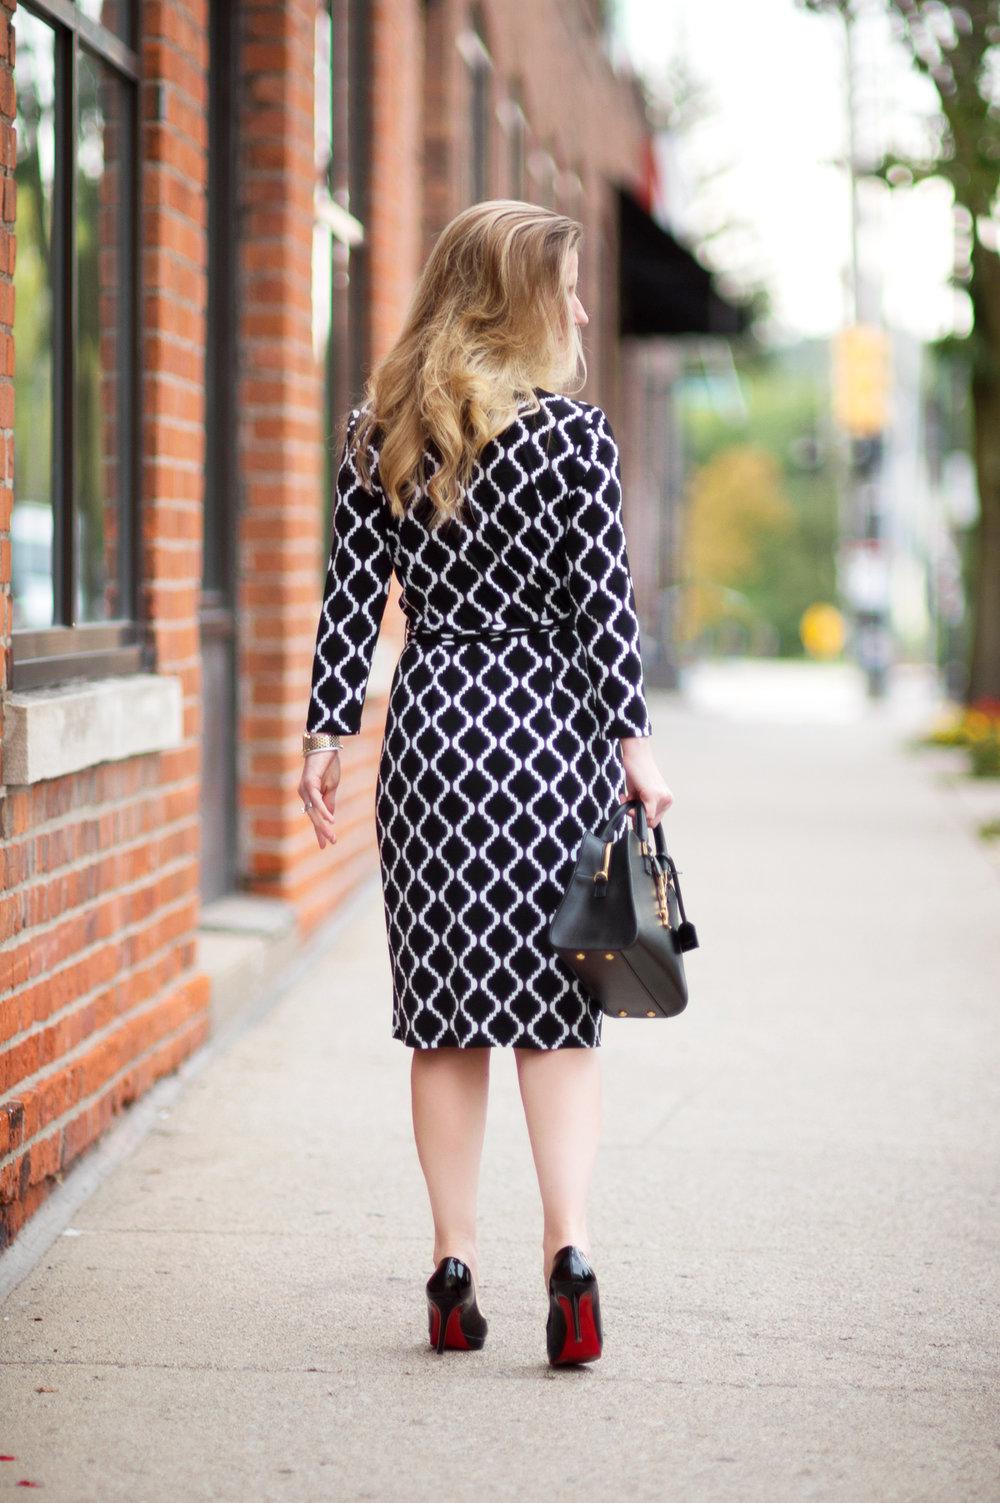 Petite-Fashion-and-Style-Blog---Maggy-London-Philomena-Dress-3.jpg